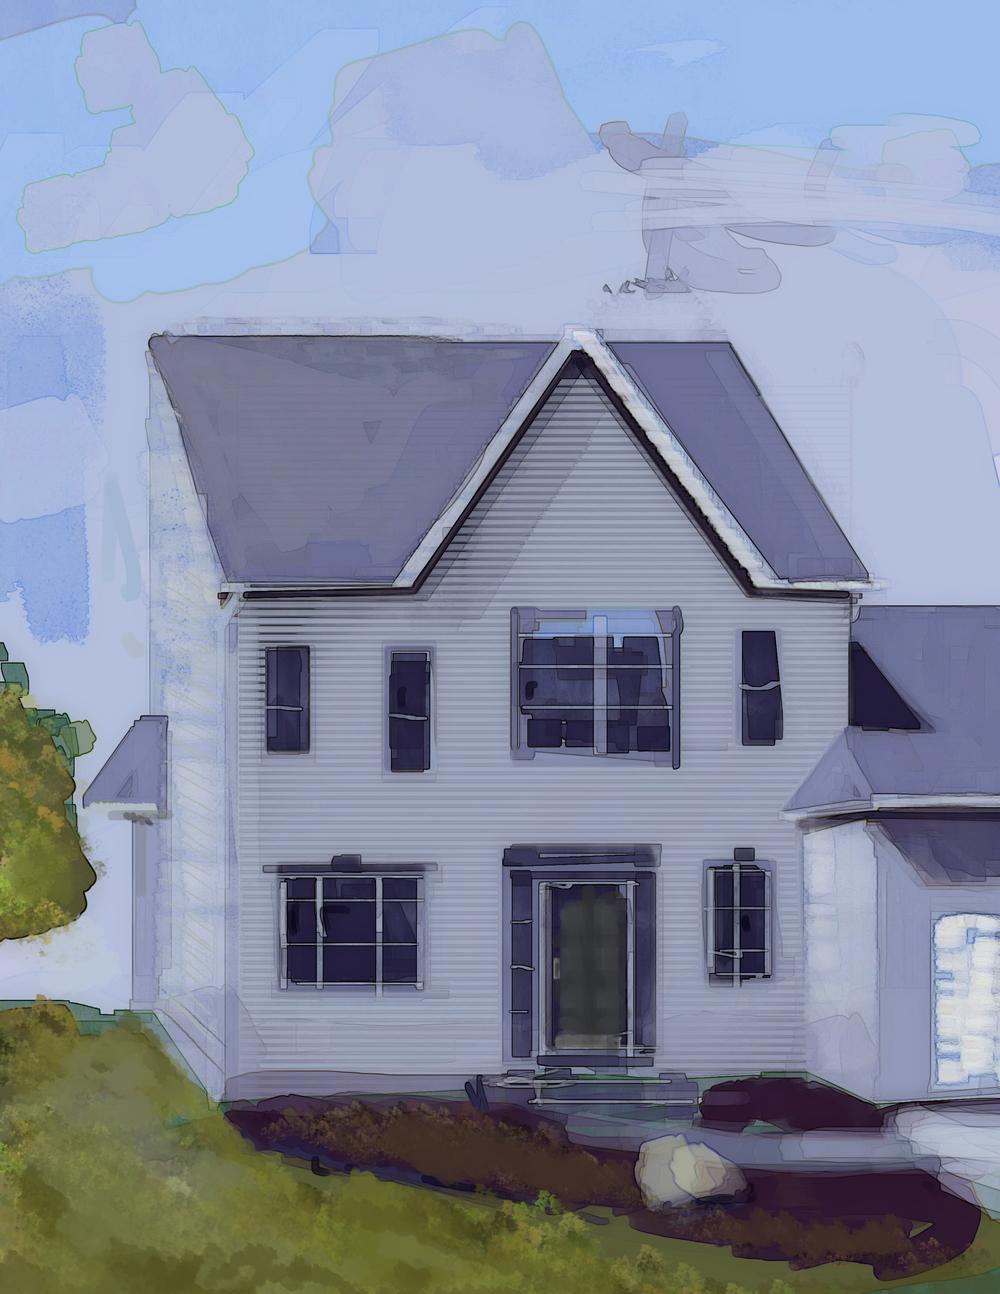 housestudy.jpg